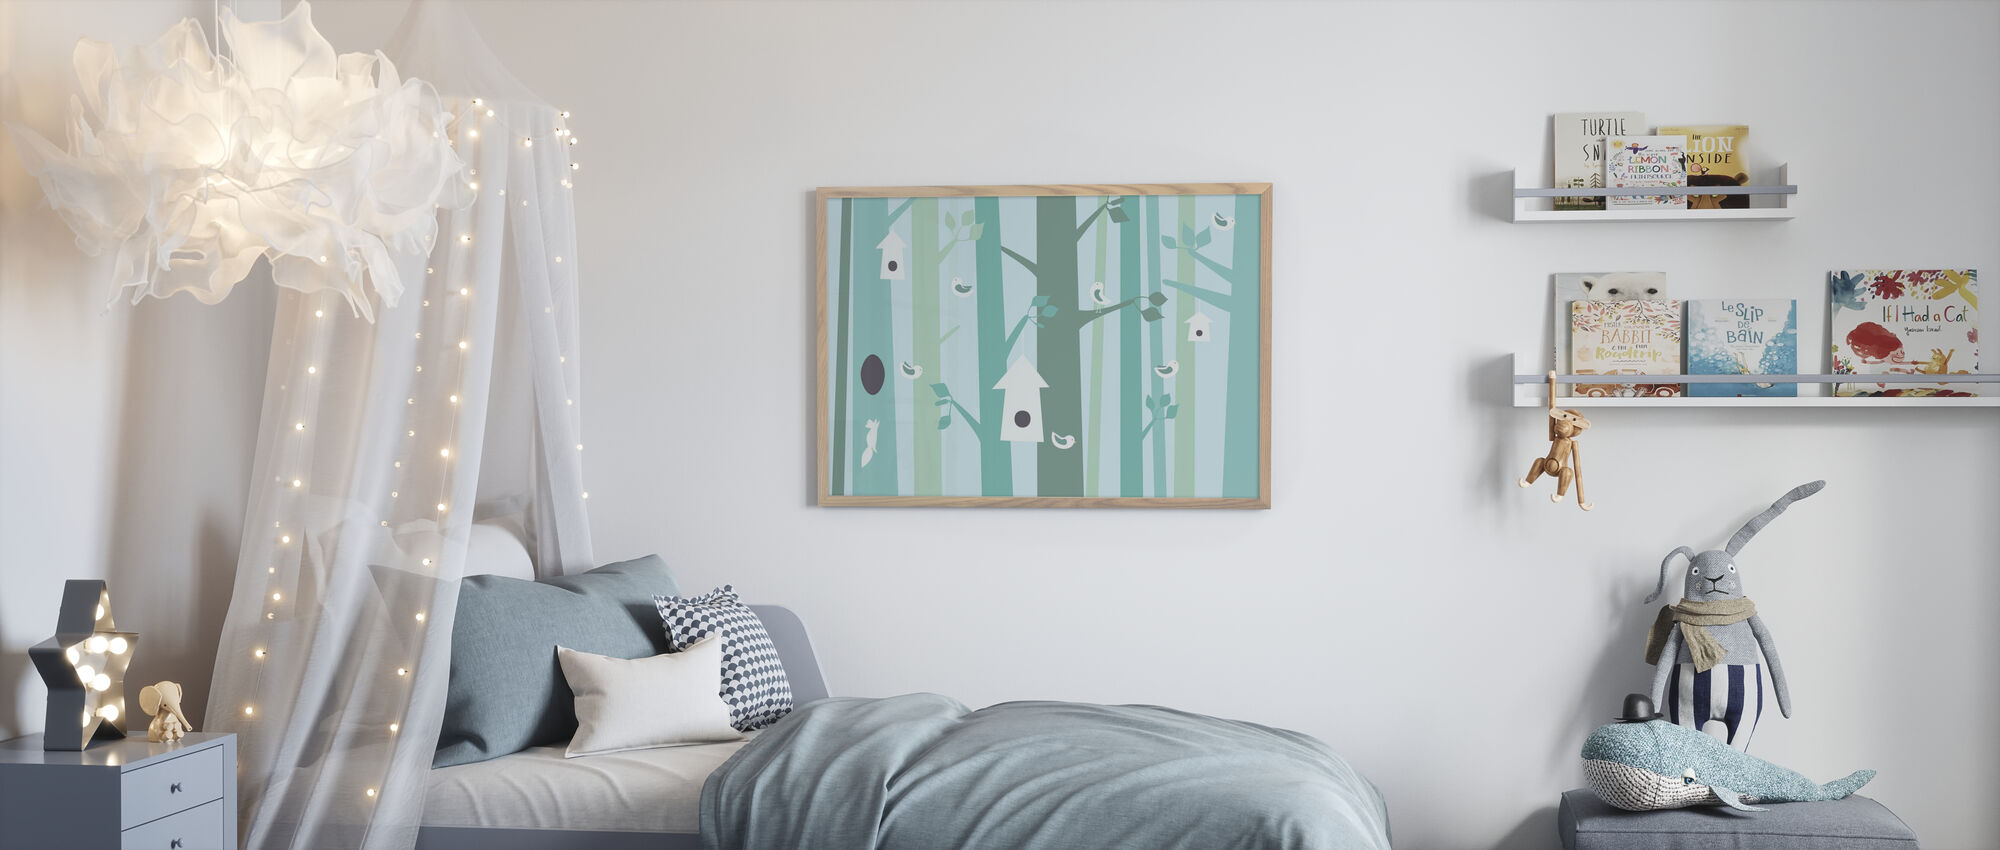 Vogelbos - Groen - Ingelijste print - Kinderkamer